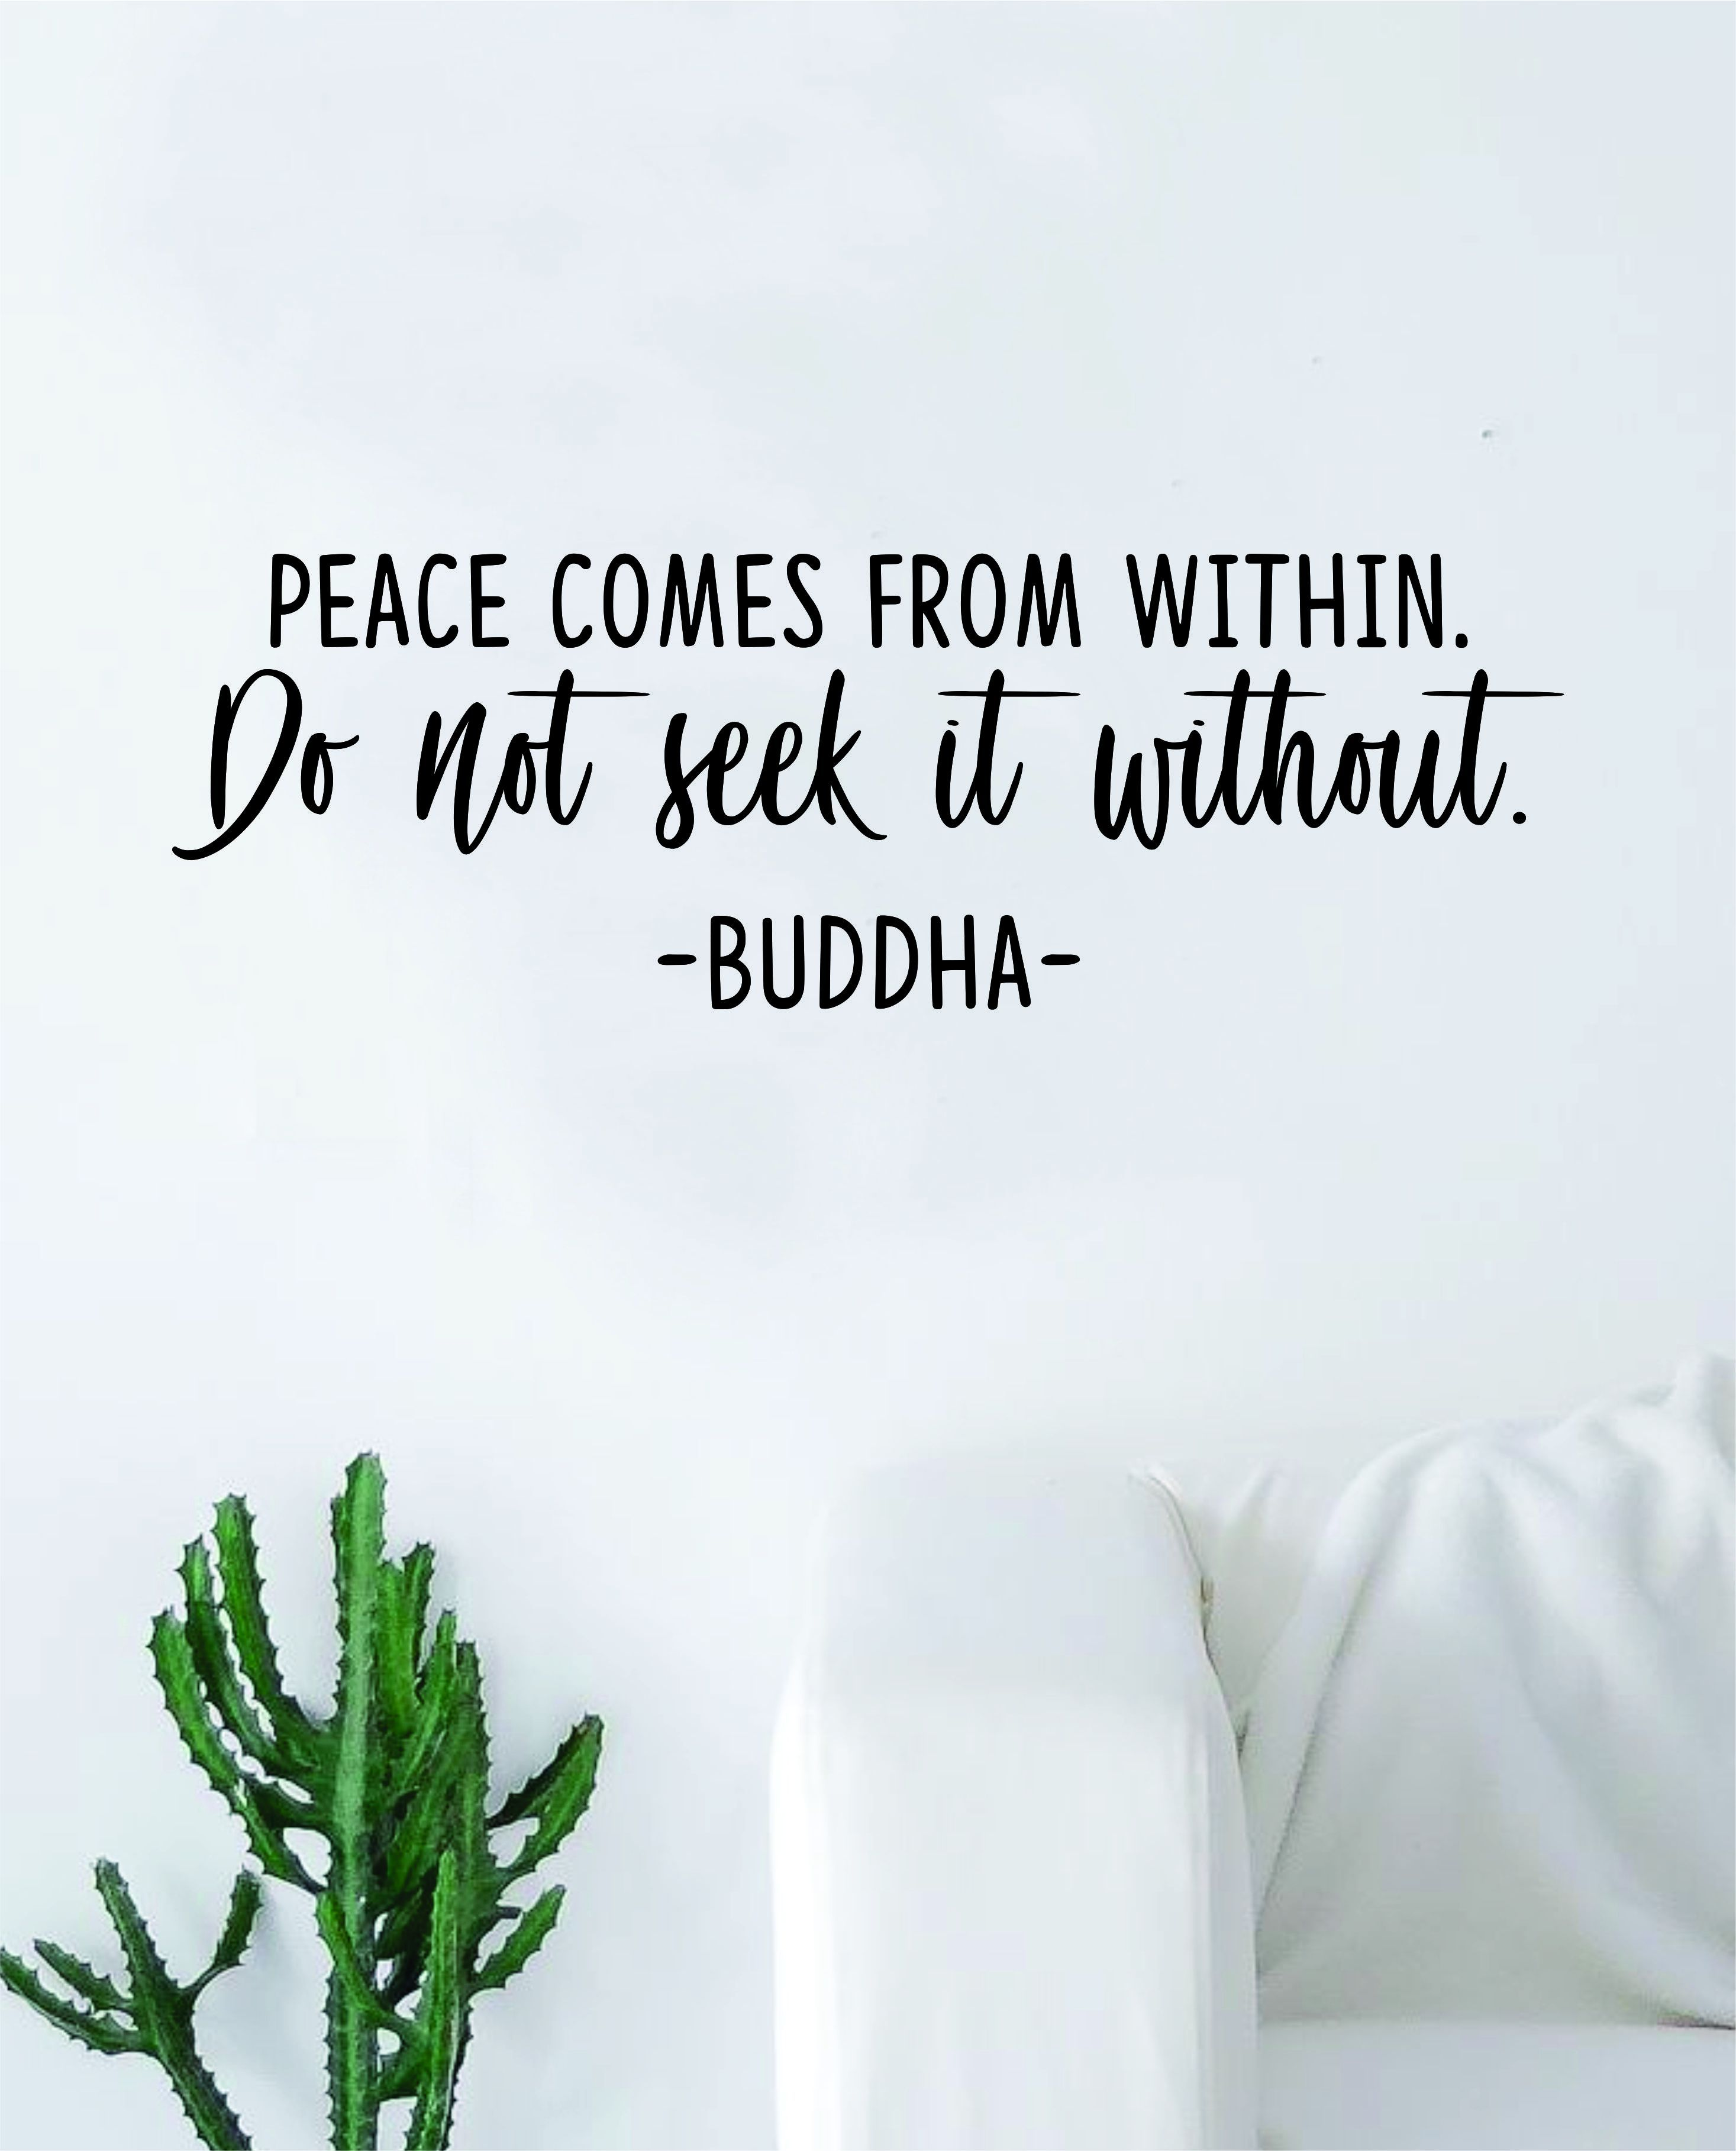 Buddha Peace Comes from Within v2 Quote Decal Sticker Wall Vinyl Art Decor Bedroom Living Room Namaste Yoga Mandala Om Meditate Zen Lotus Inspirational - green